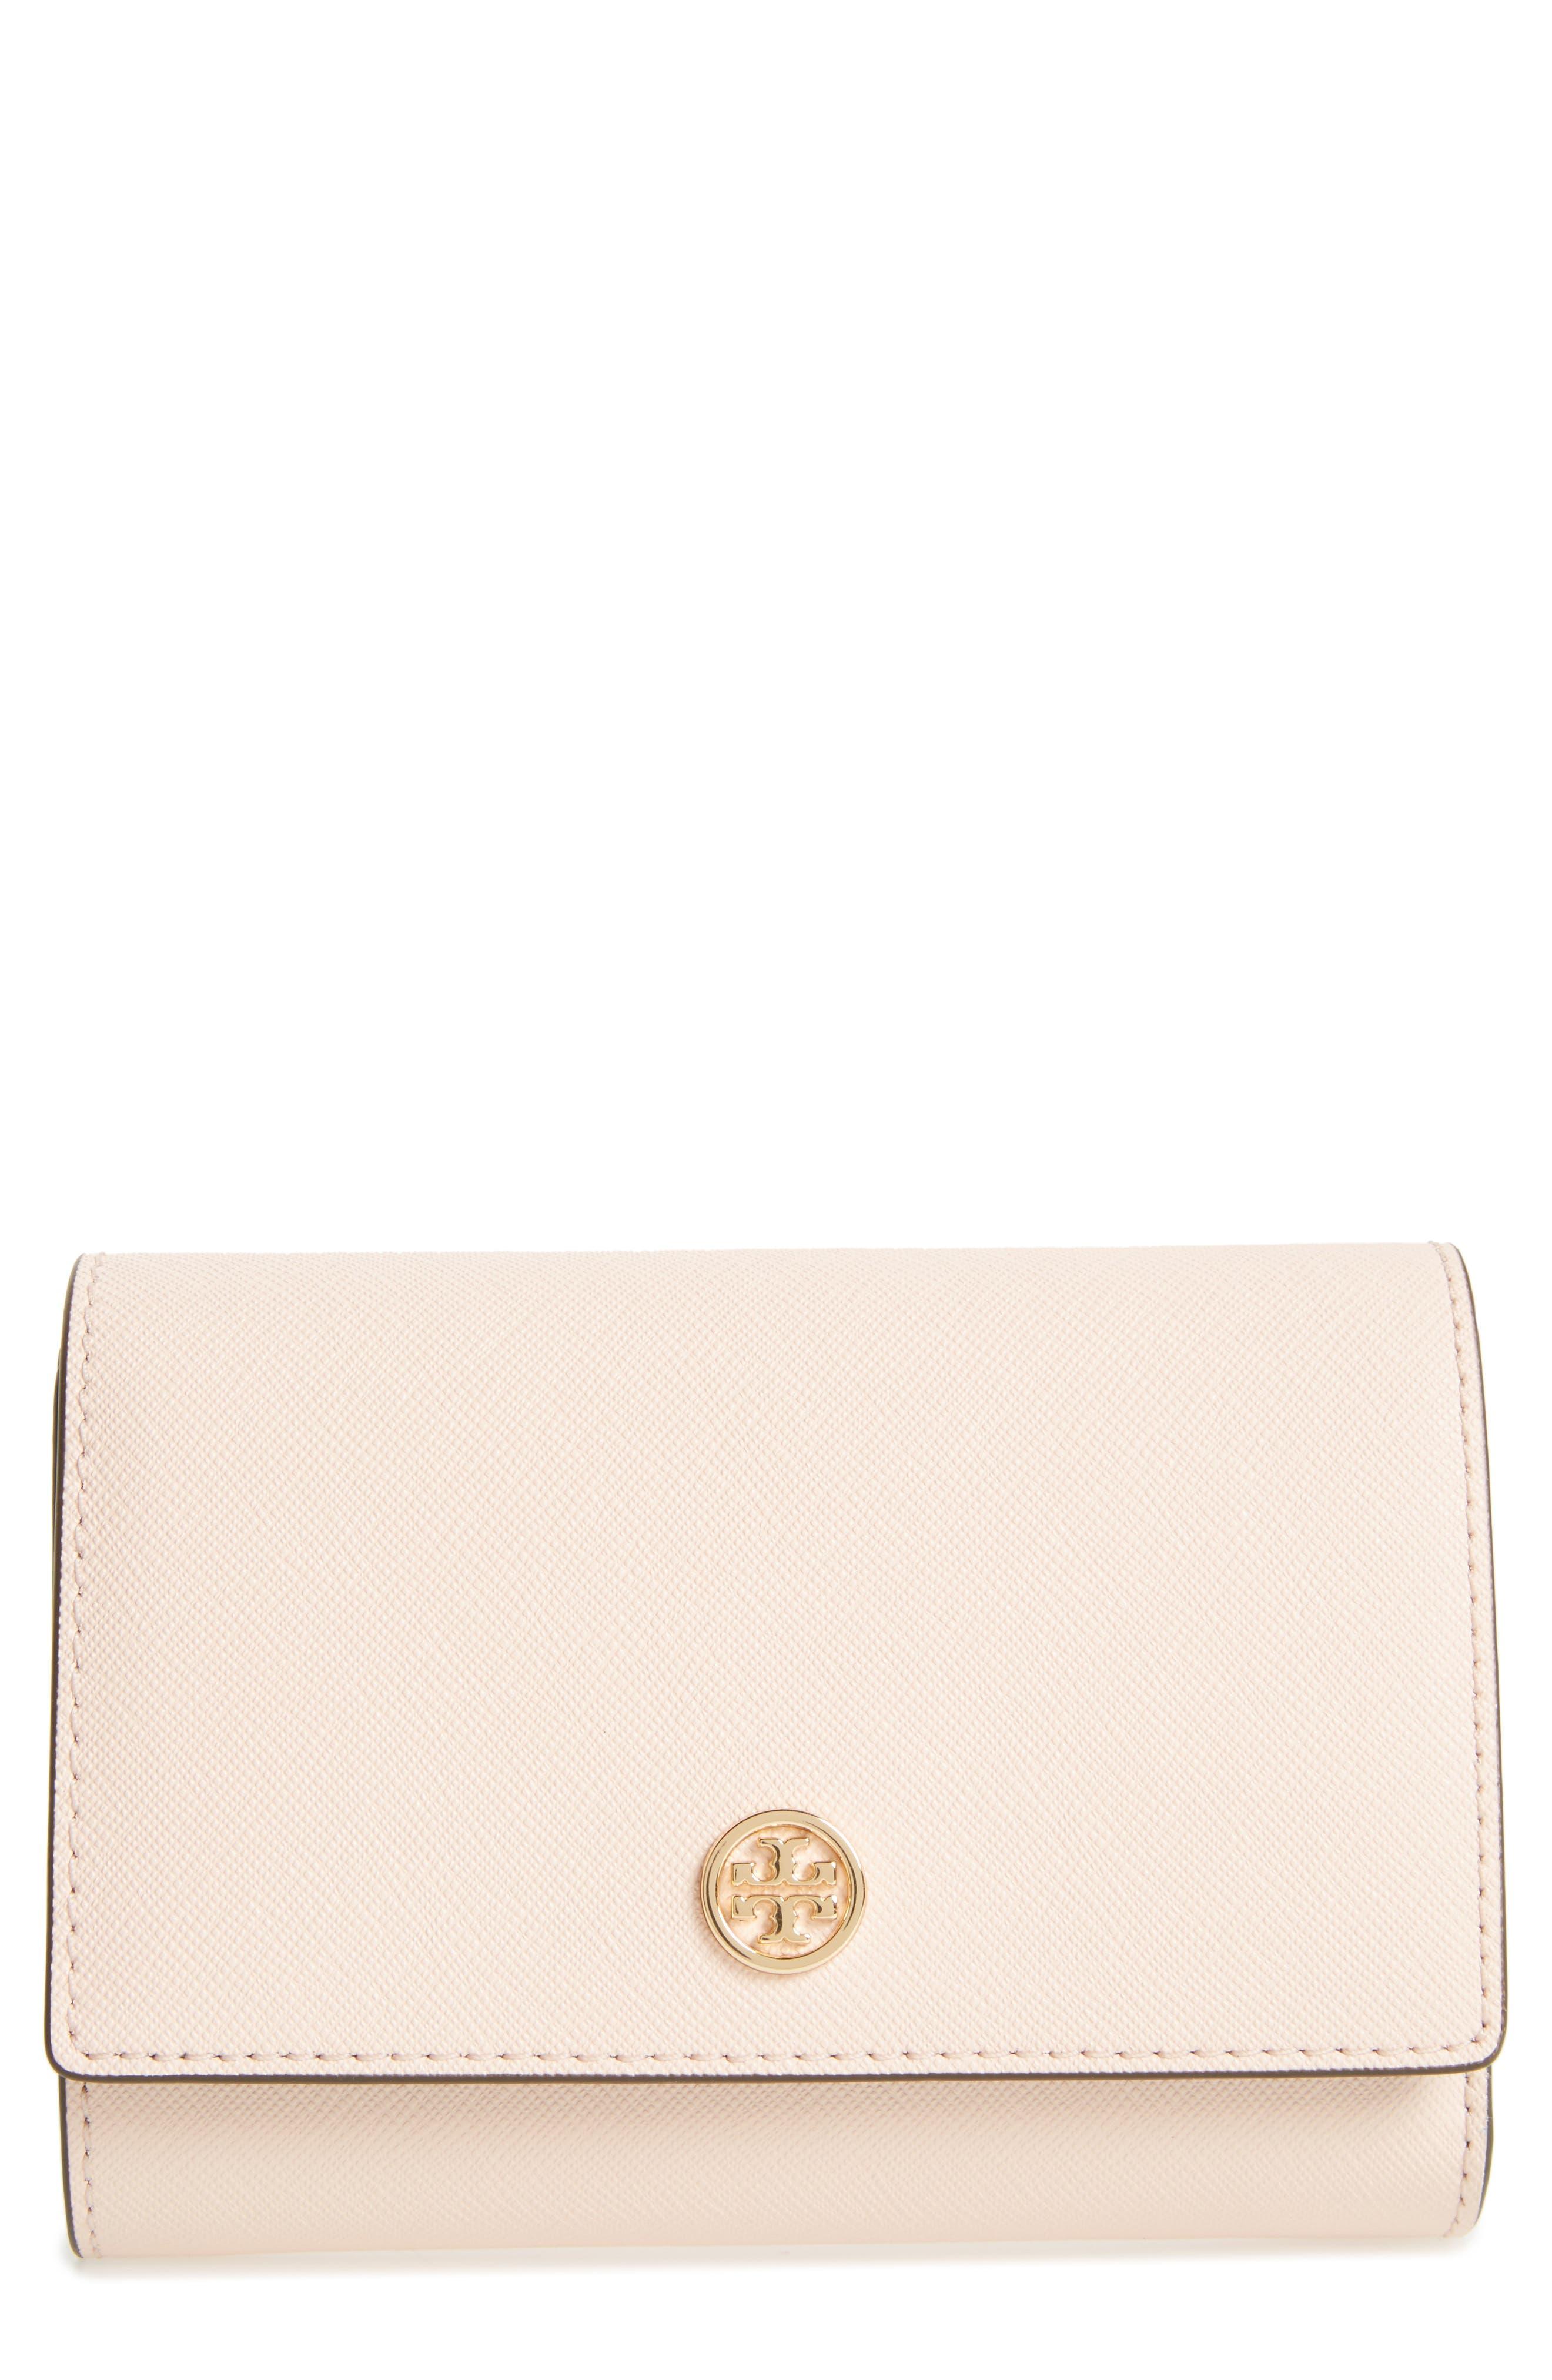 Robinson Medium Leather Wallet,                             Main thumbnail 1, color,                             Pale Apricot / Royal Navy